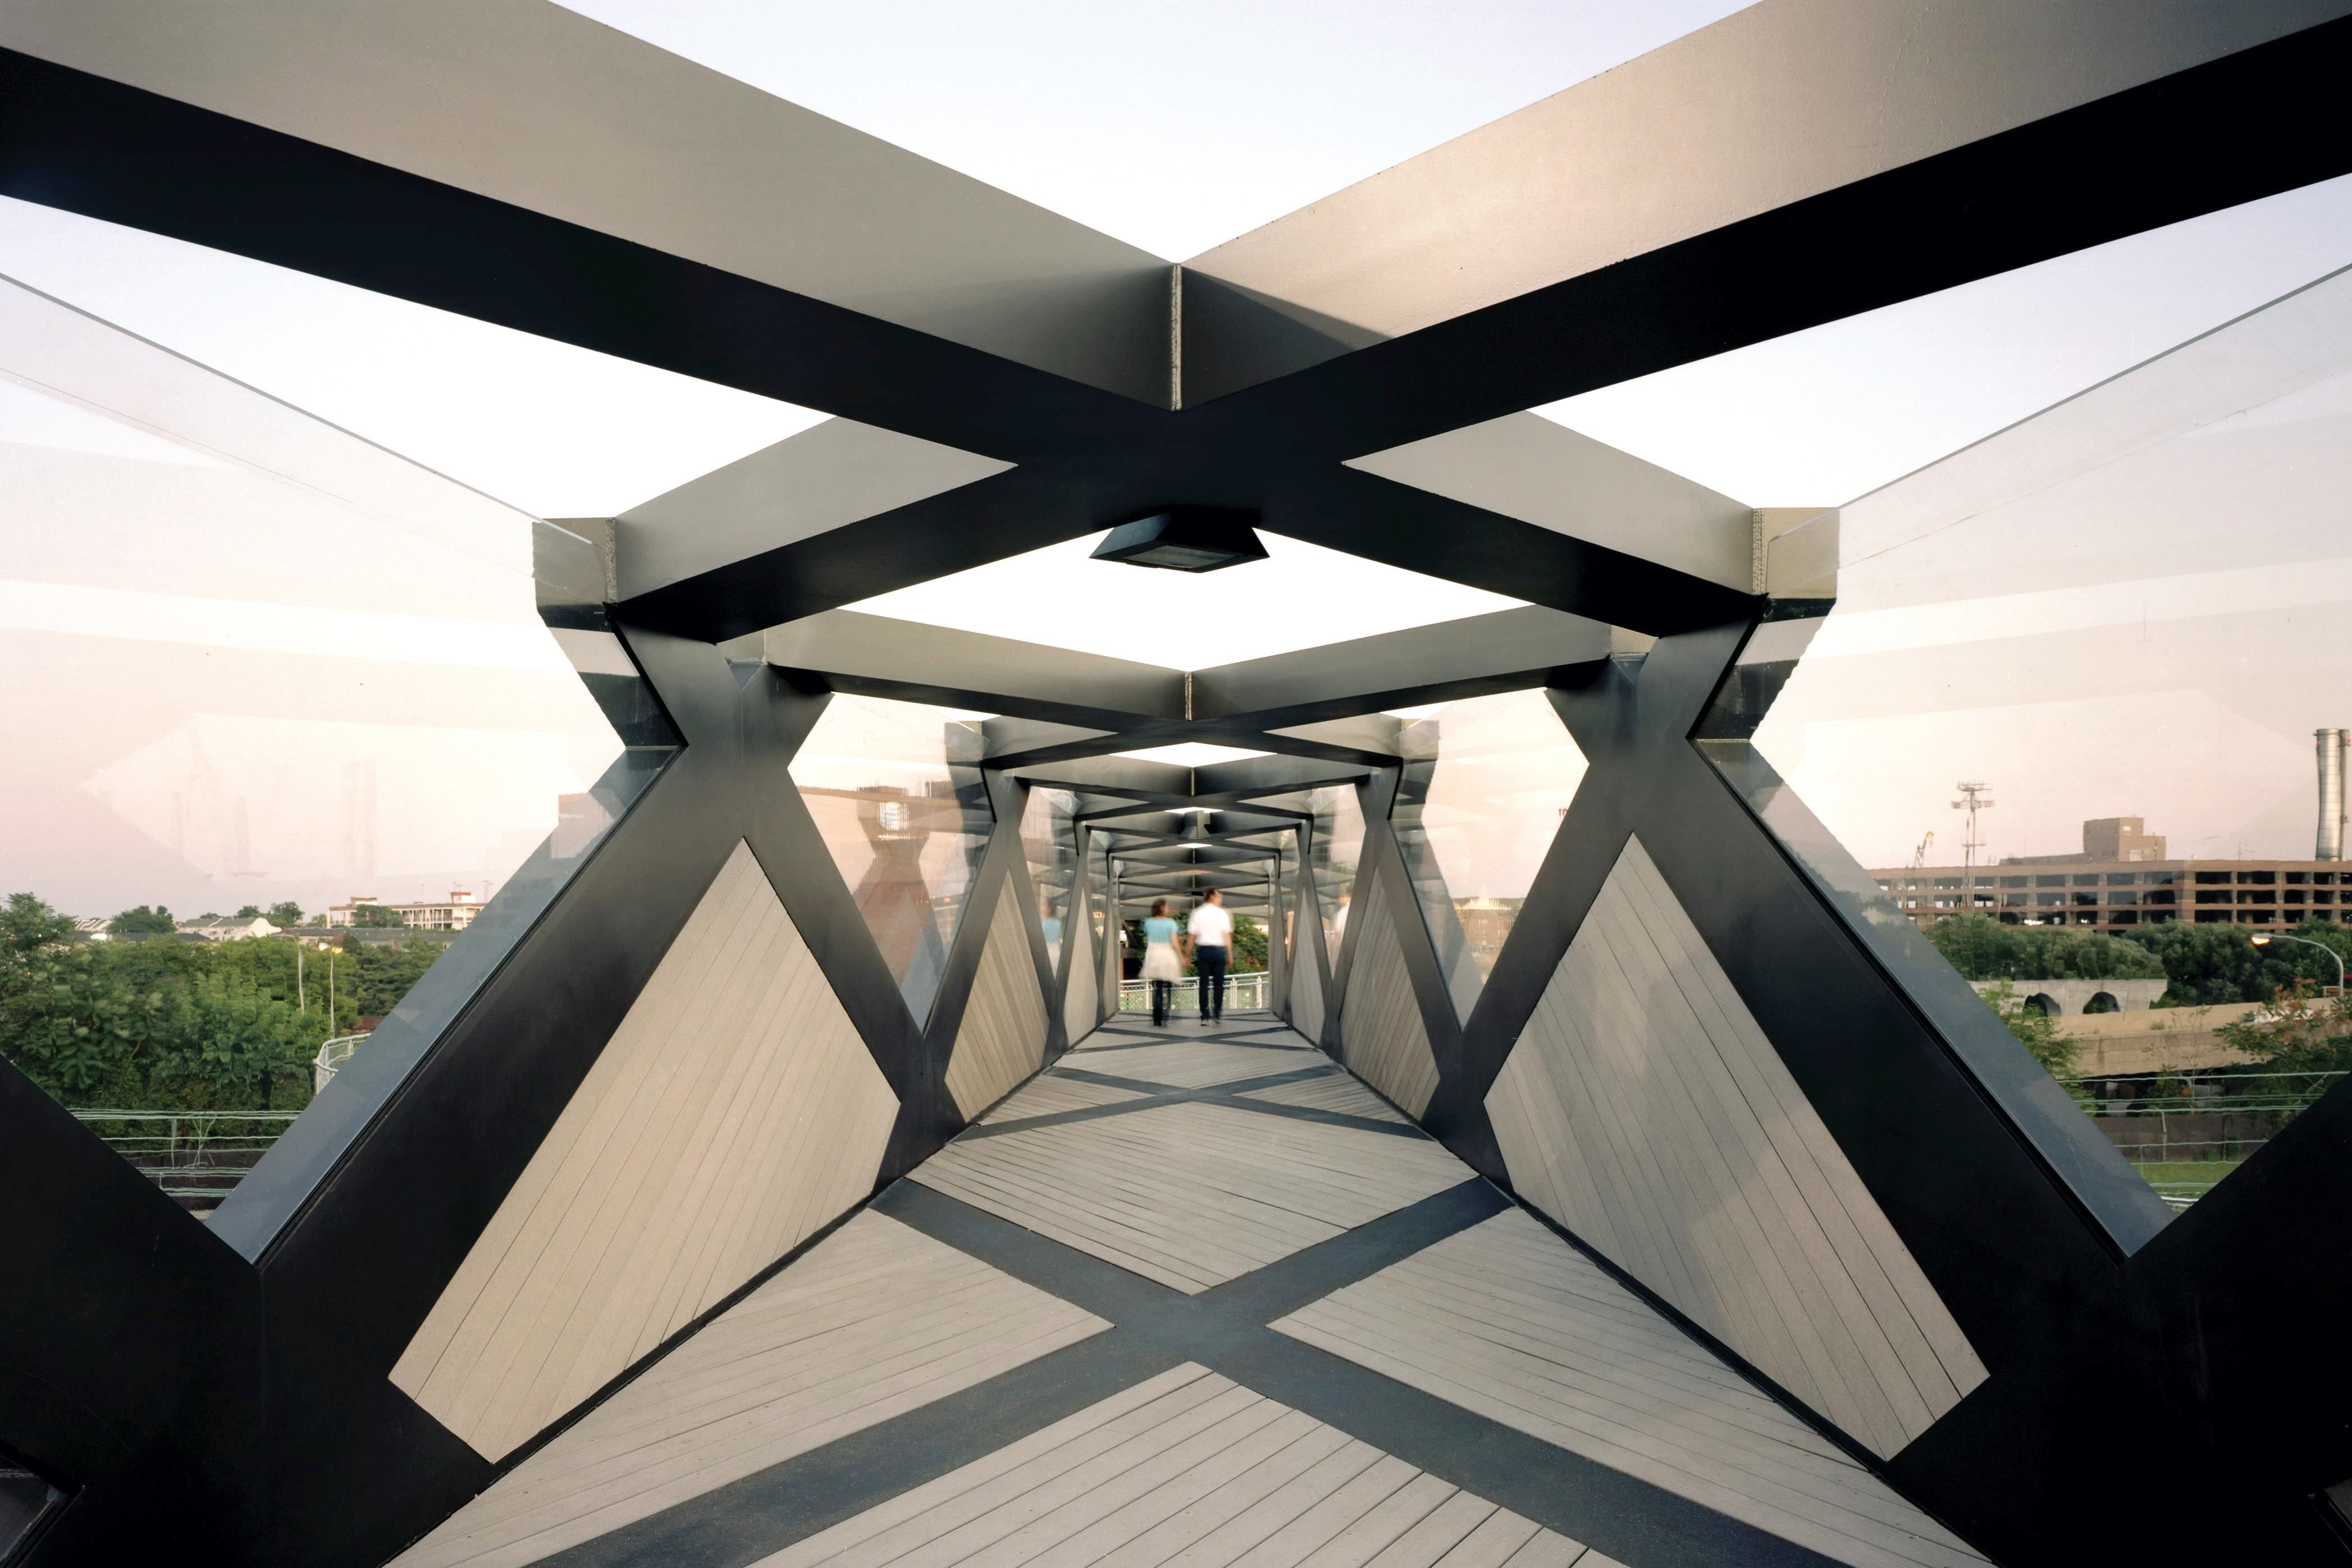 Cecil Balmond And Arupu0027s London Based Advanced Geometry Unit Unveil A New  Pedestrian Bridge In